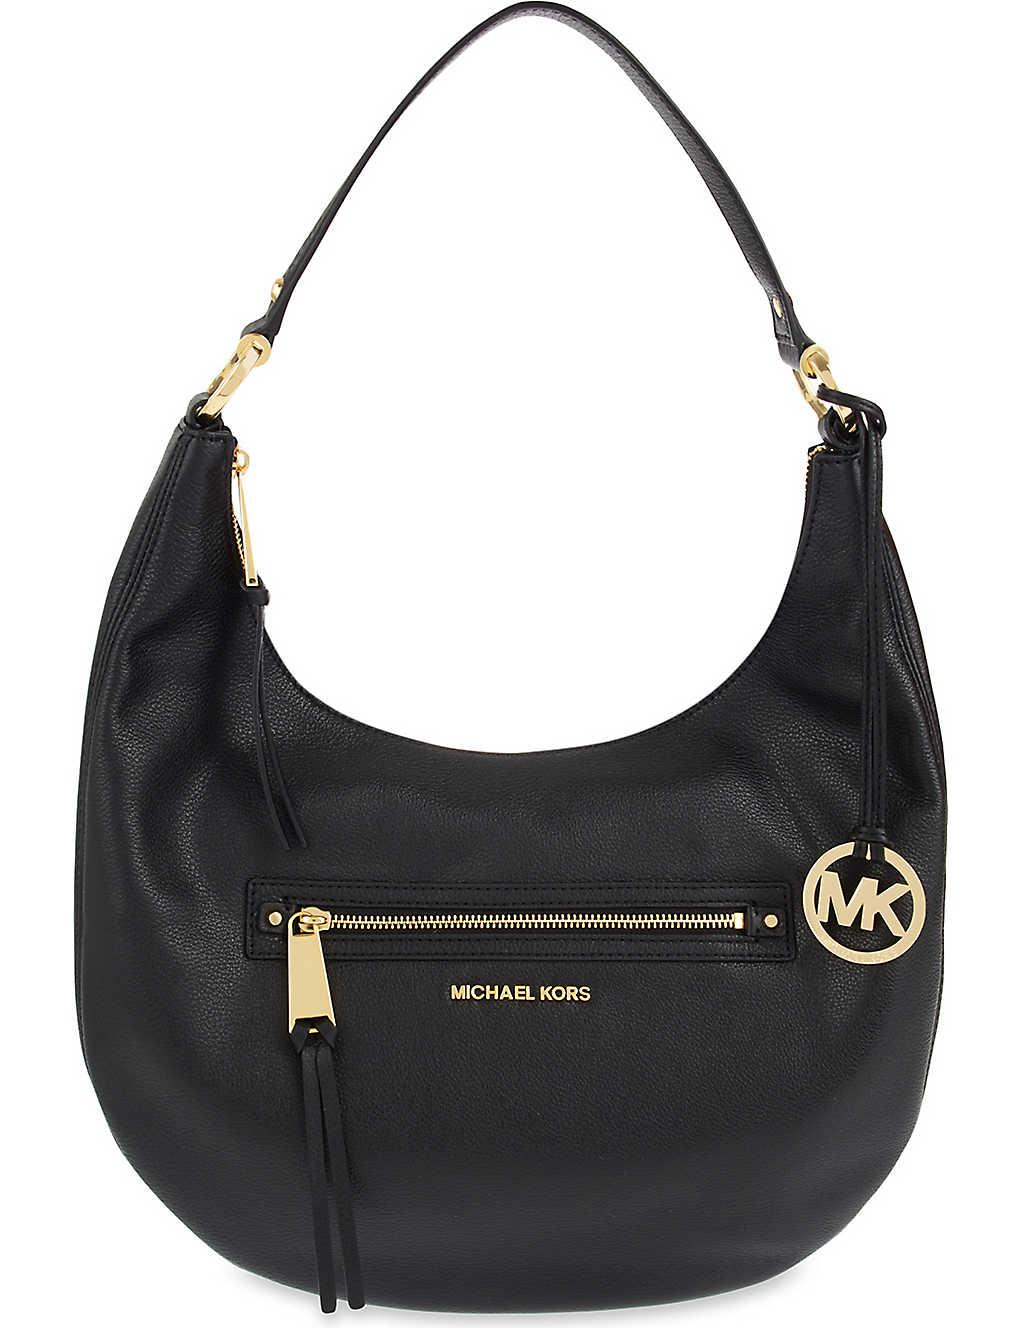 01565115c9fd MICHAEL MICHAEL KORS - Rhea large leather shoulder bag | Selfridges.com